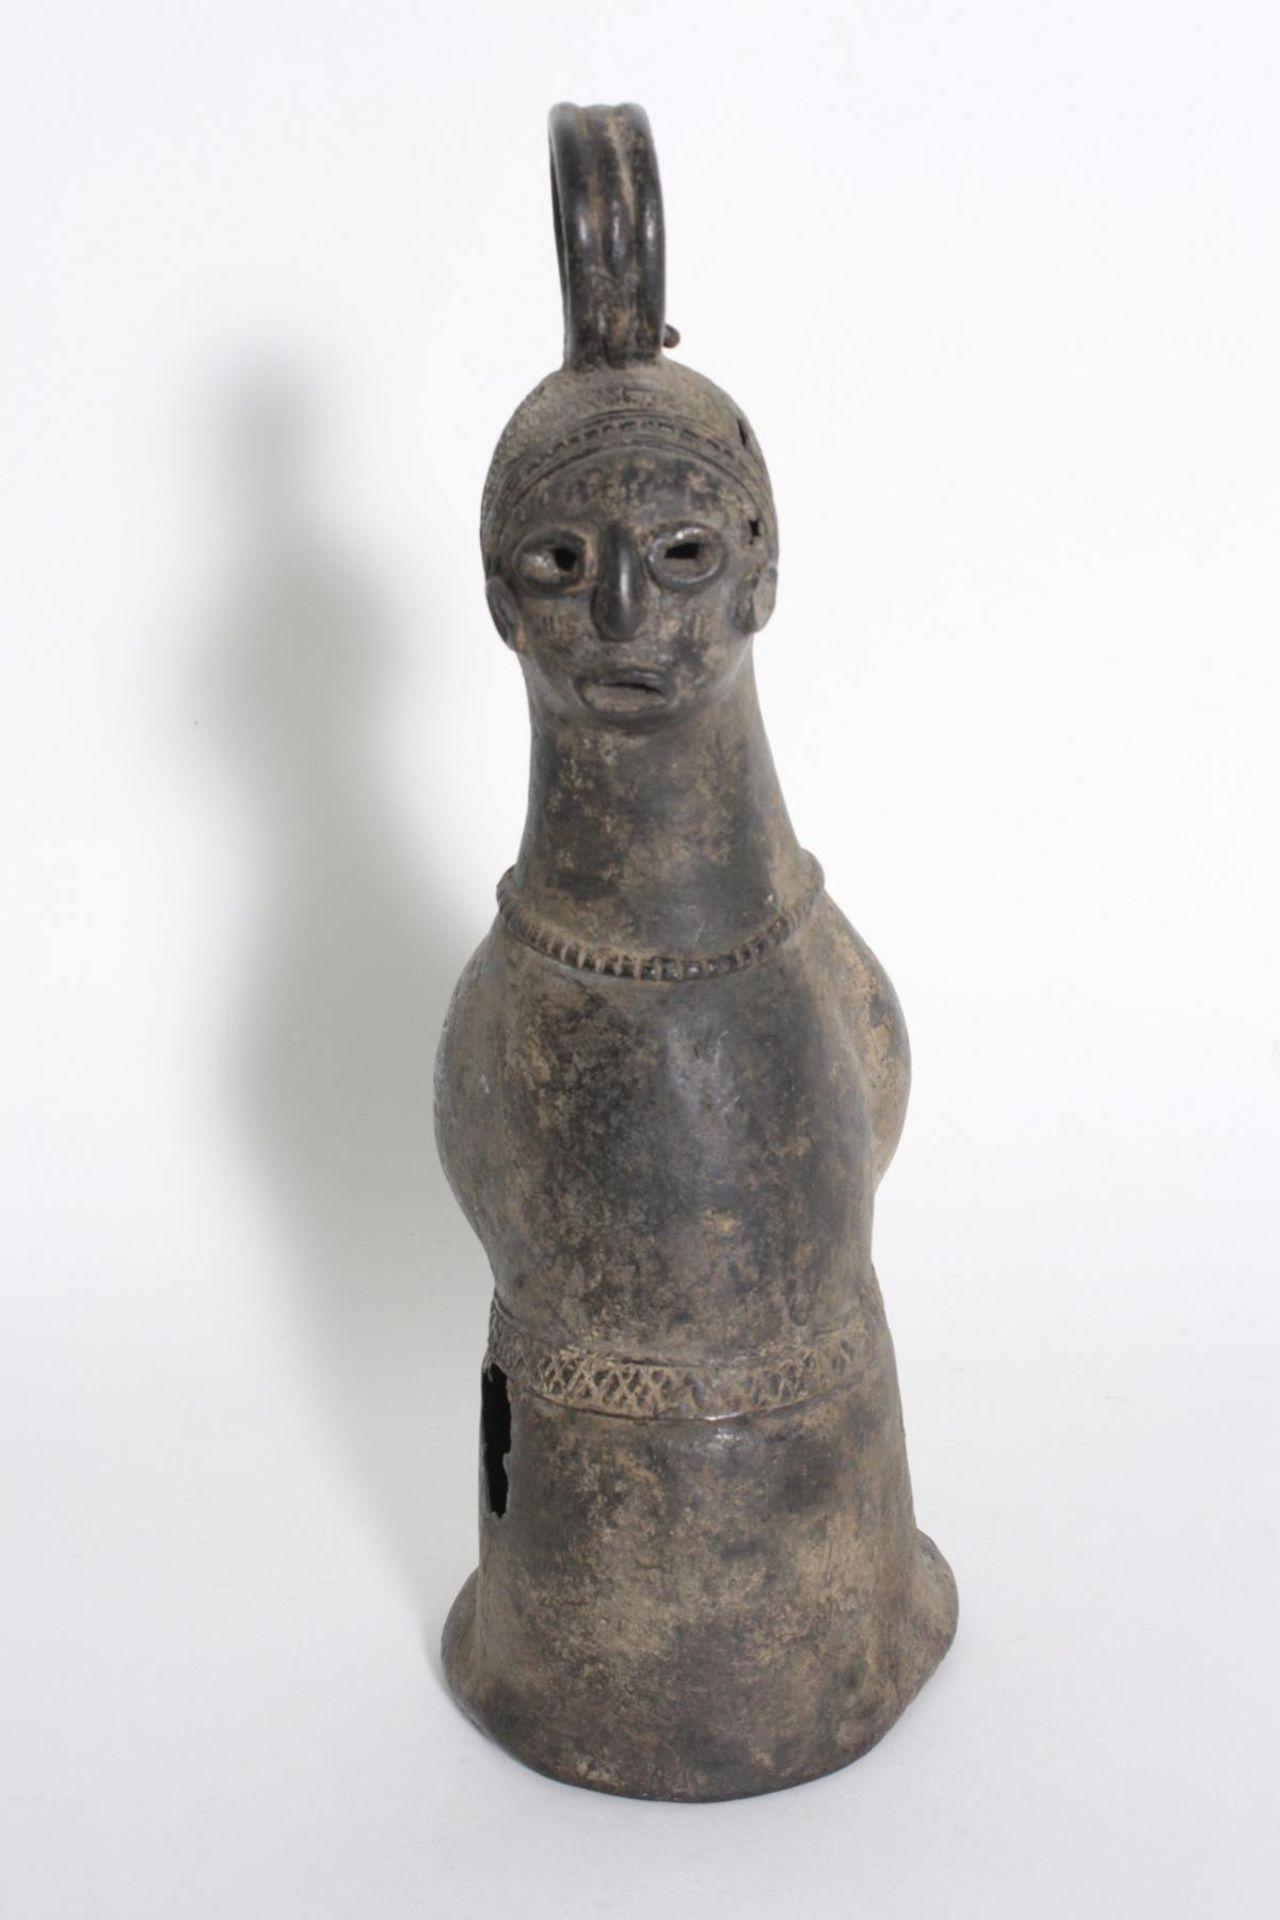 Bronze-Doppelkopf-Glocke, Benin, Nigeria, 1. Hälfte 20. Jh. - Bild 3 aus 5